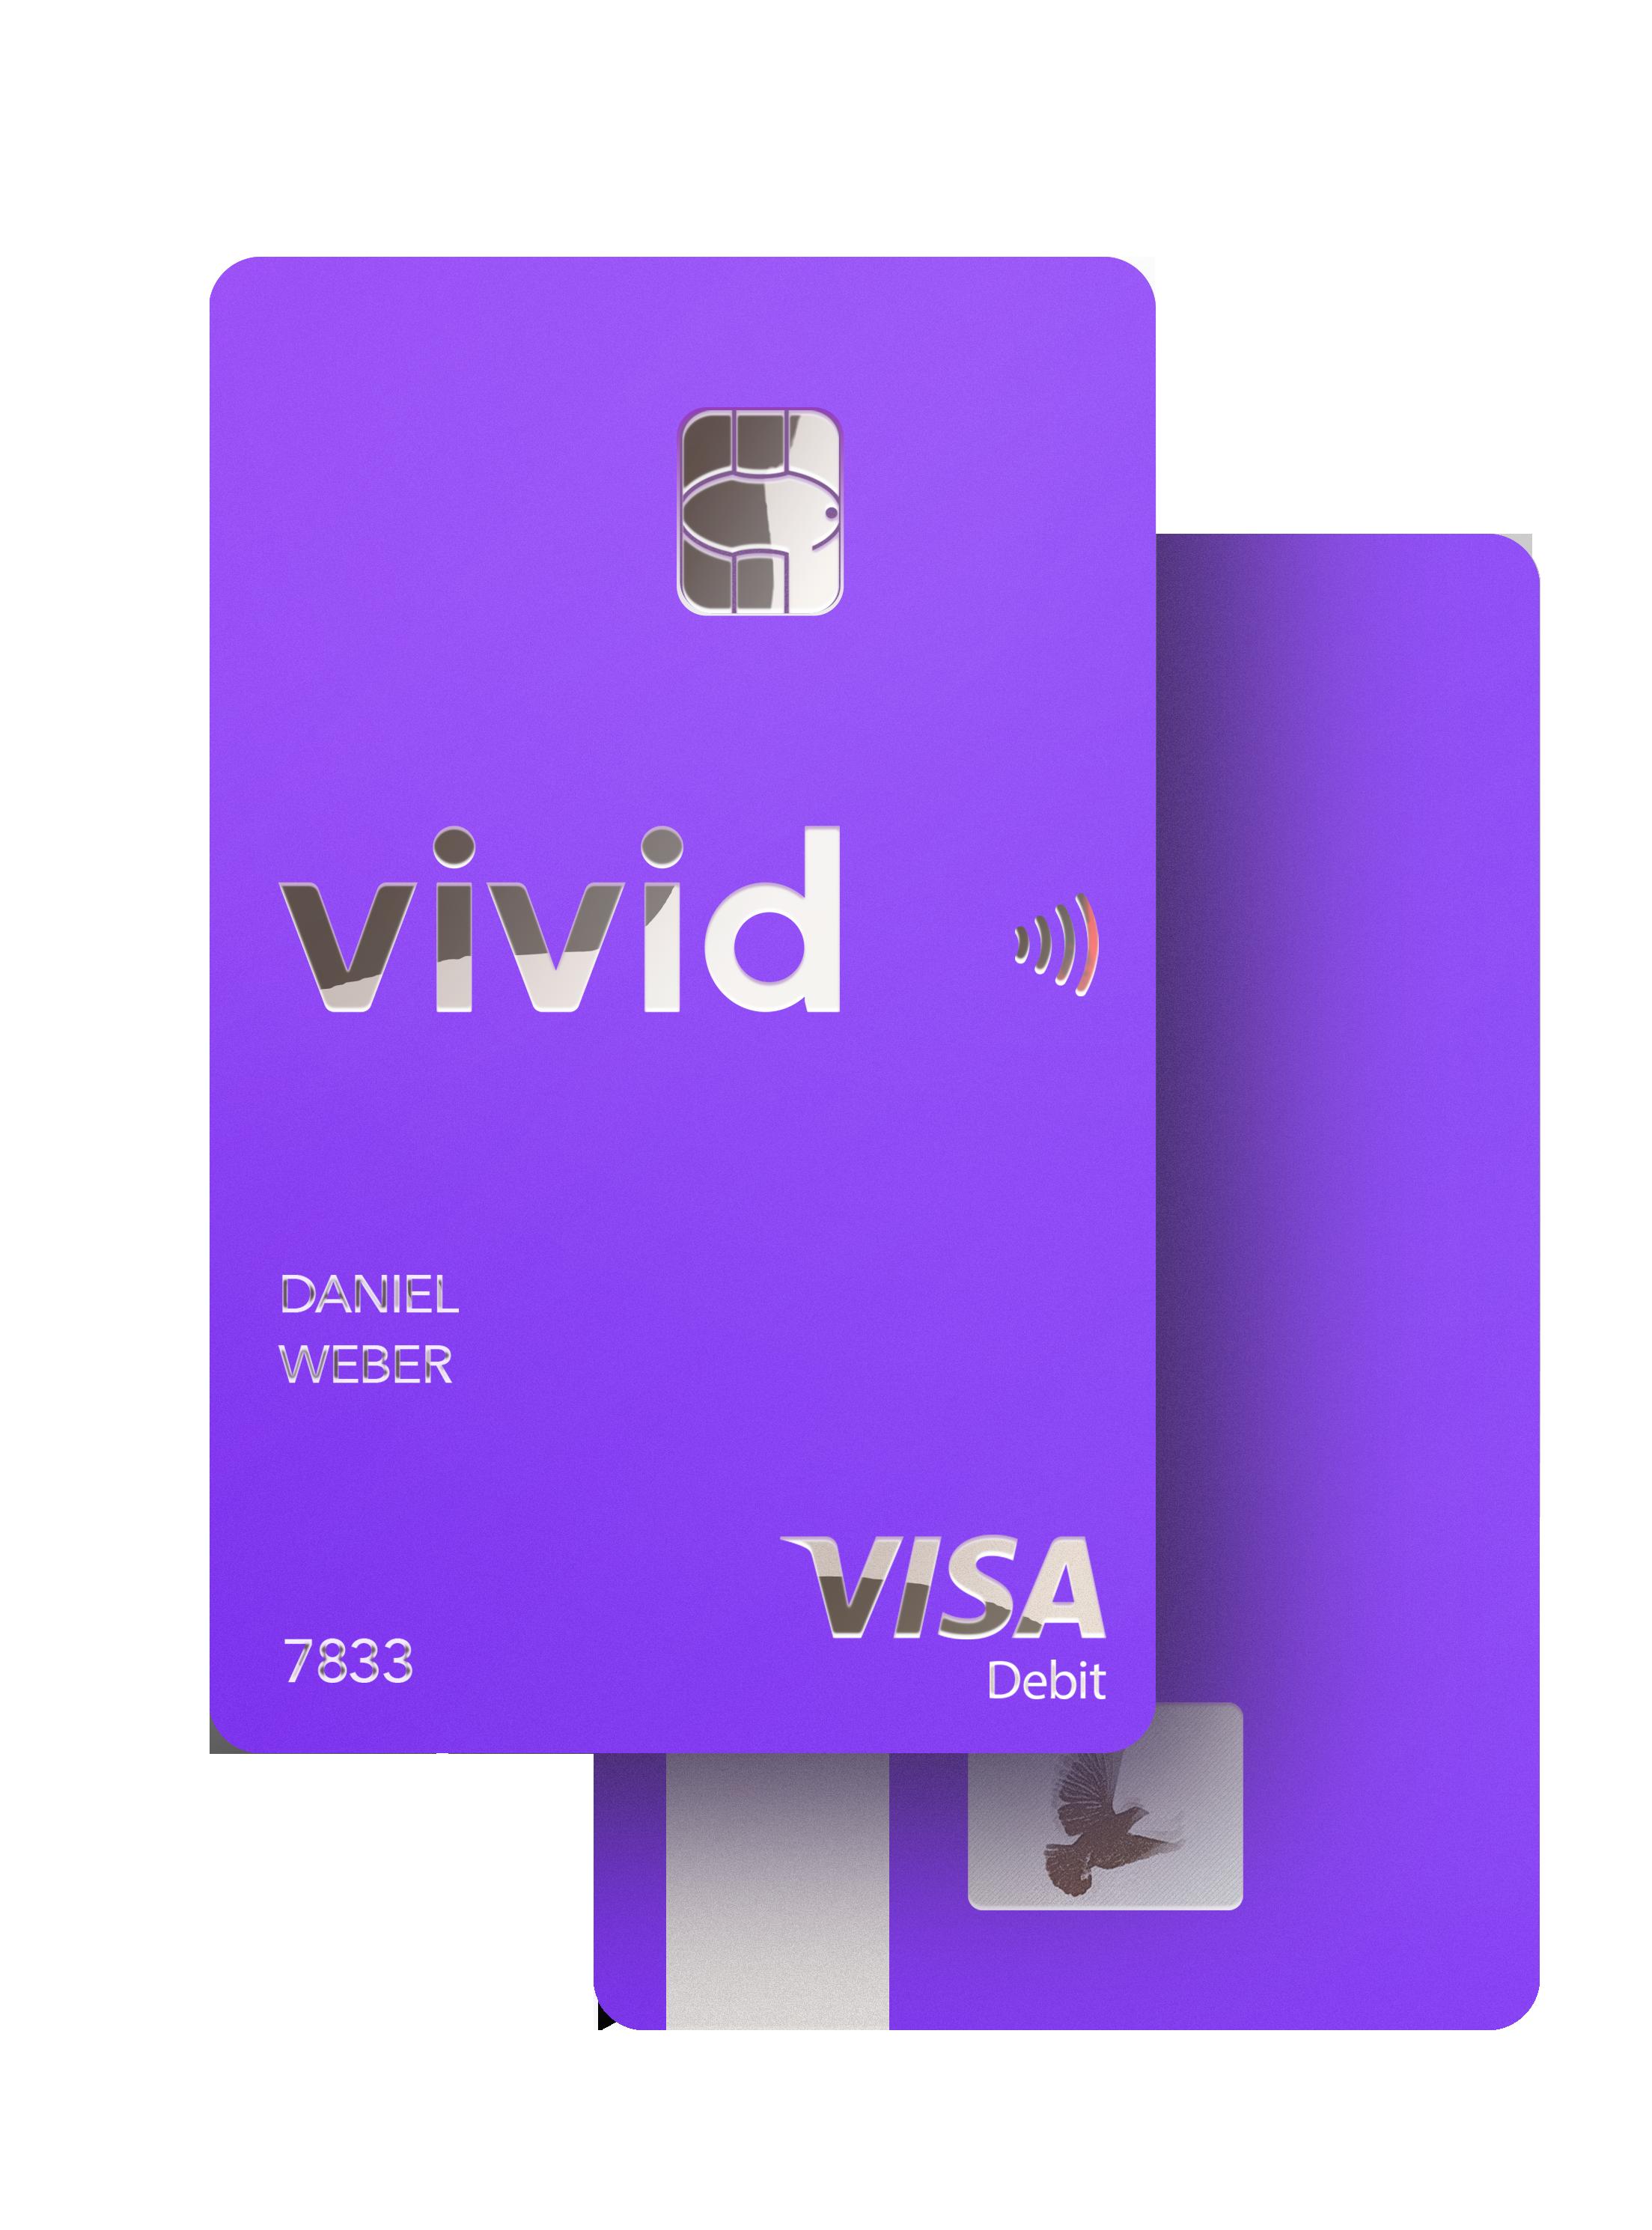 Kostenloses Girokonto und Vivid Debit Visa Karte